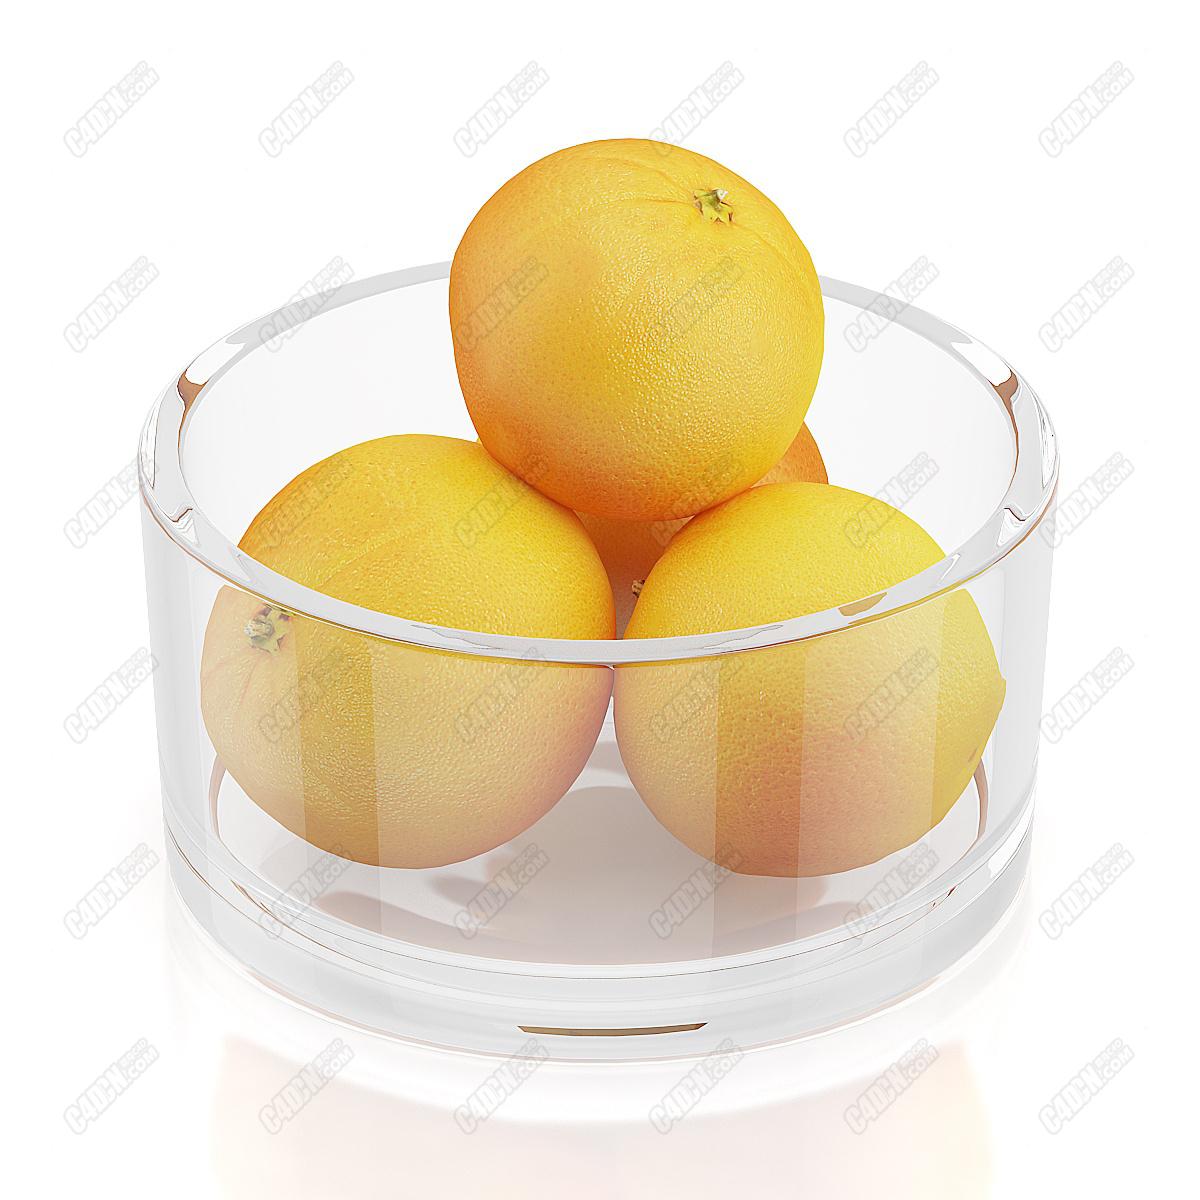 C4D模型-味道甜美的黄皮大橙子水果零食(包含材质和贴图)